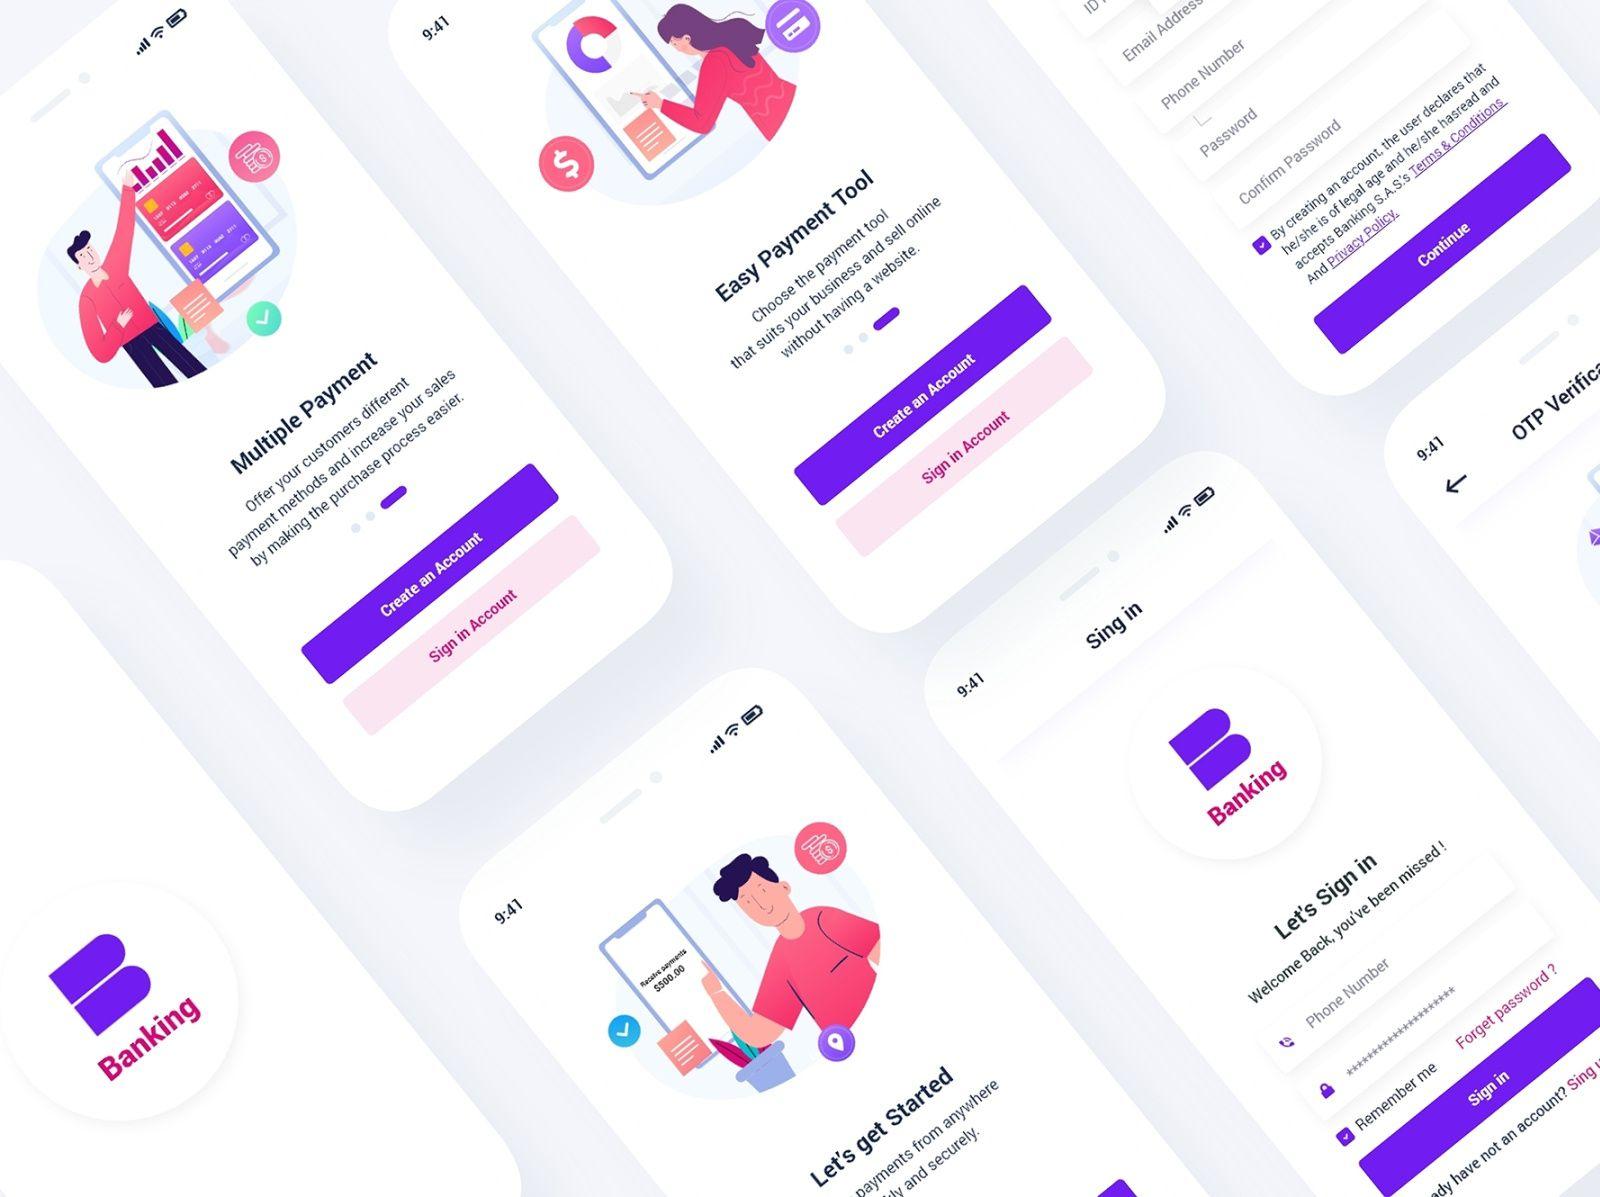 Pin on Mobile App UI/UX